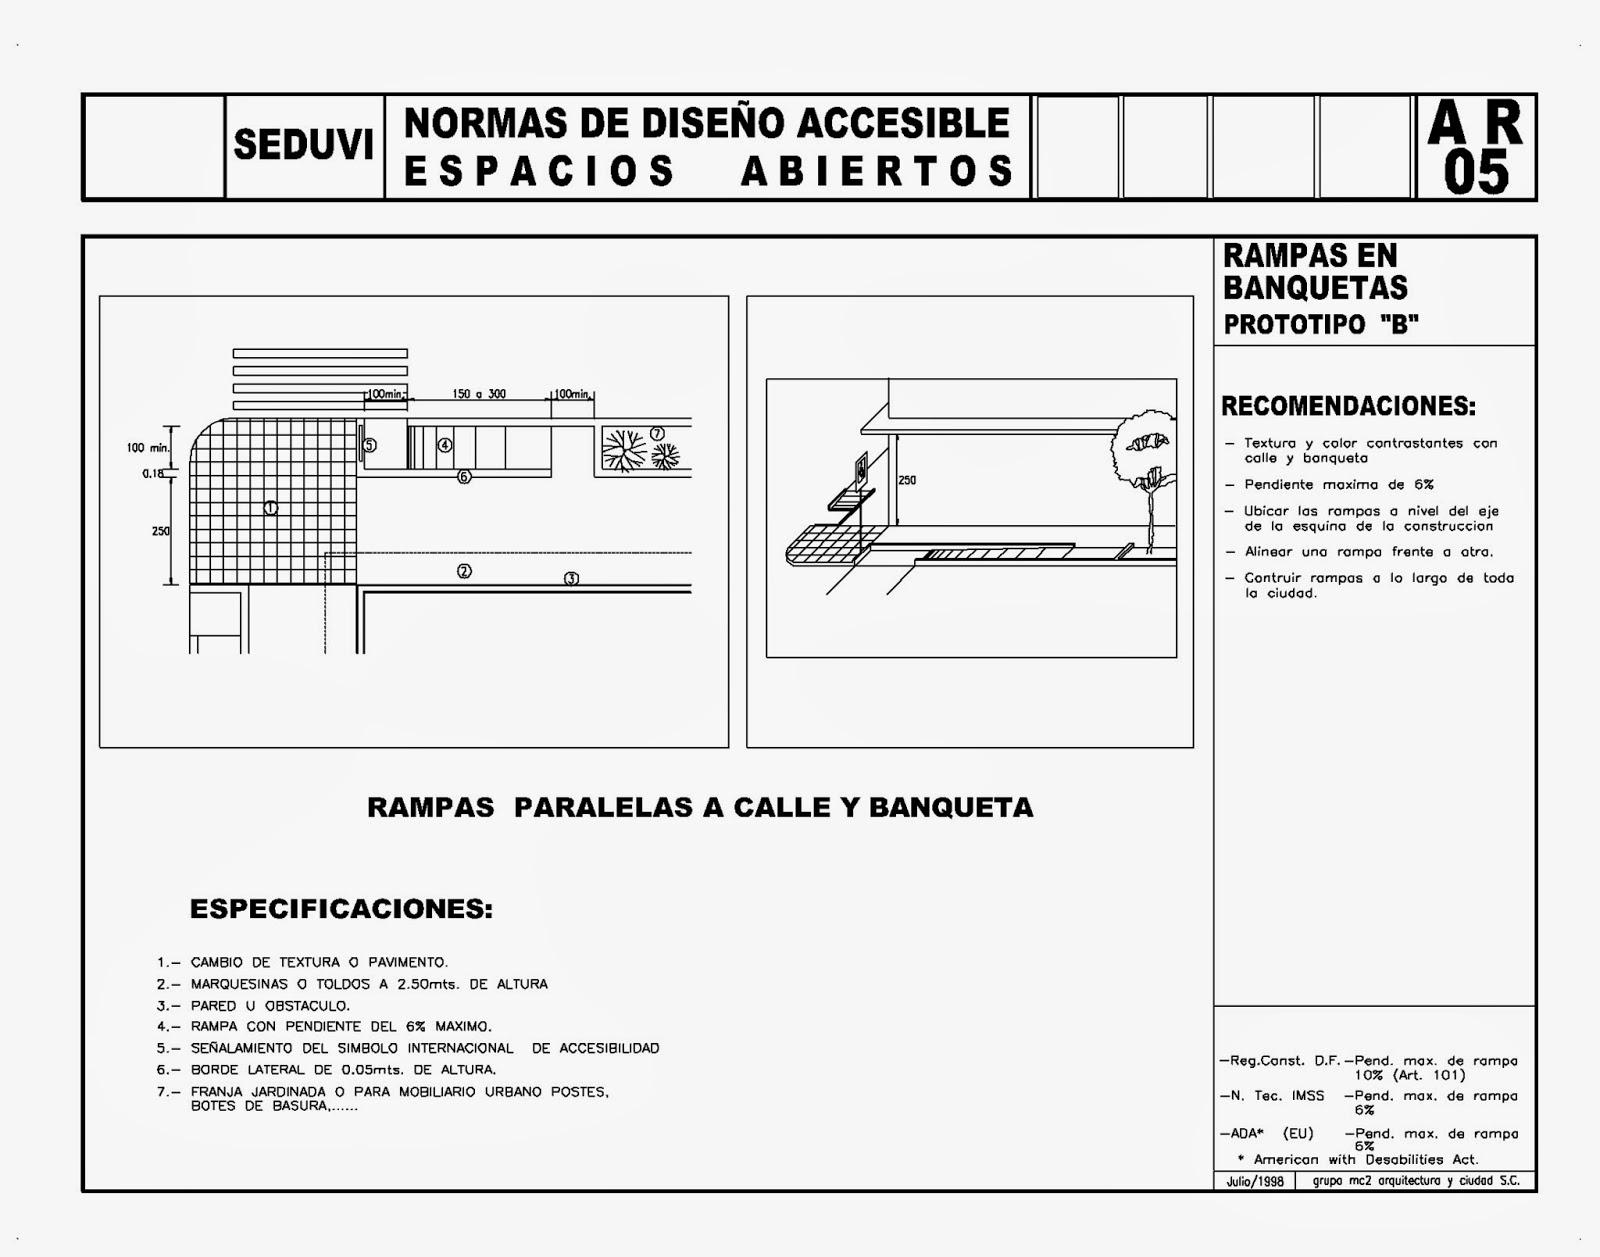 Todo para el arqui normas dise o discapacitados 1 for Asilo de ancianos pdf